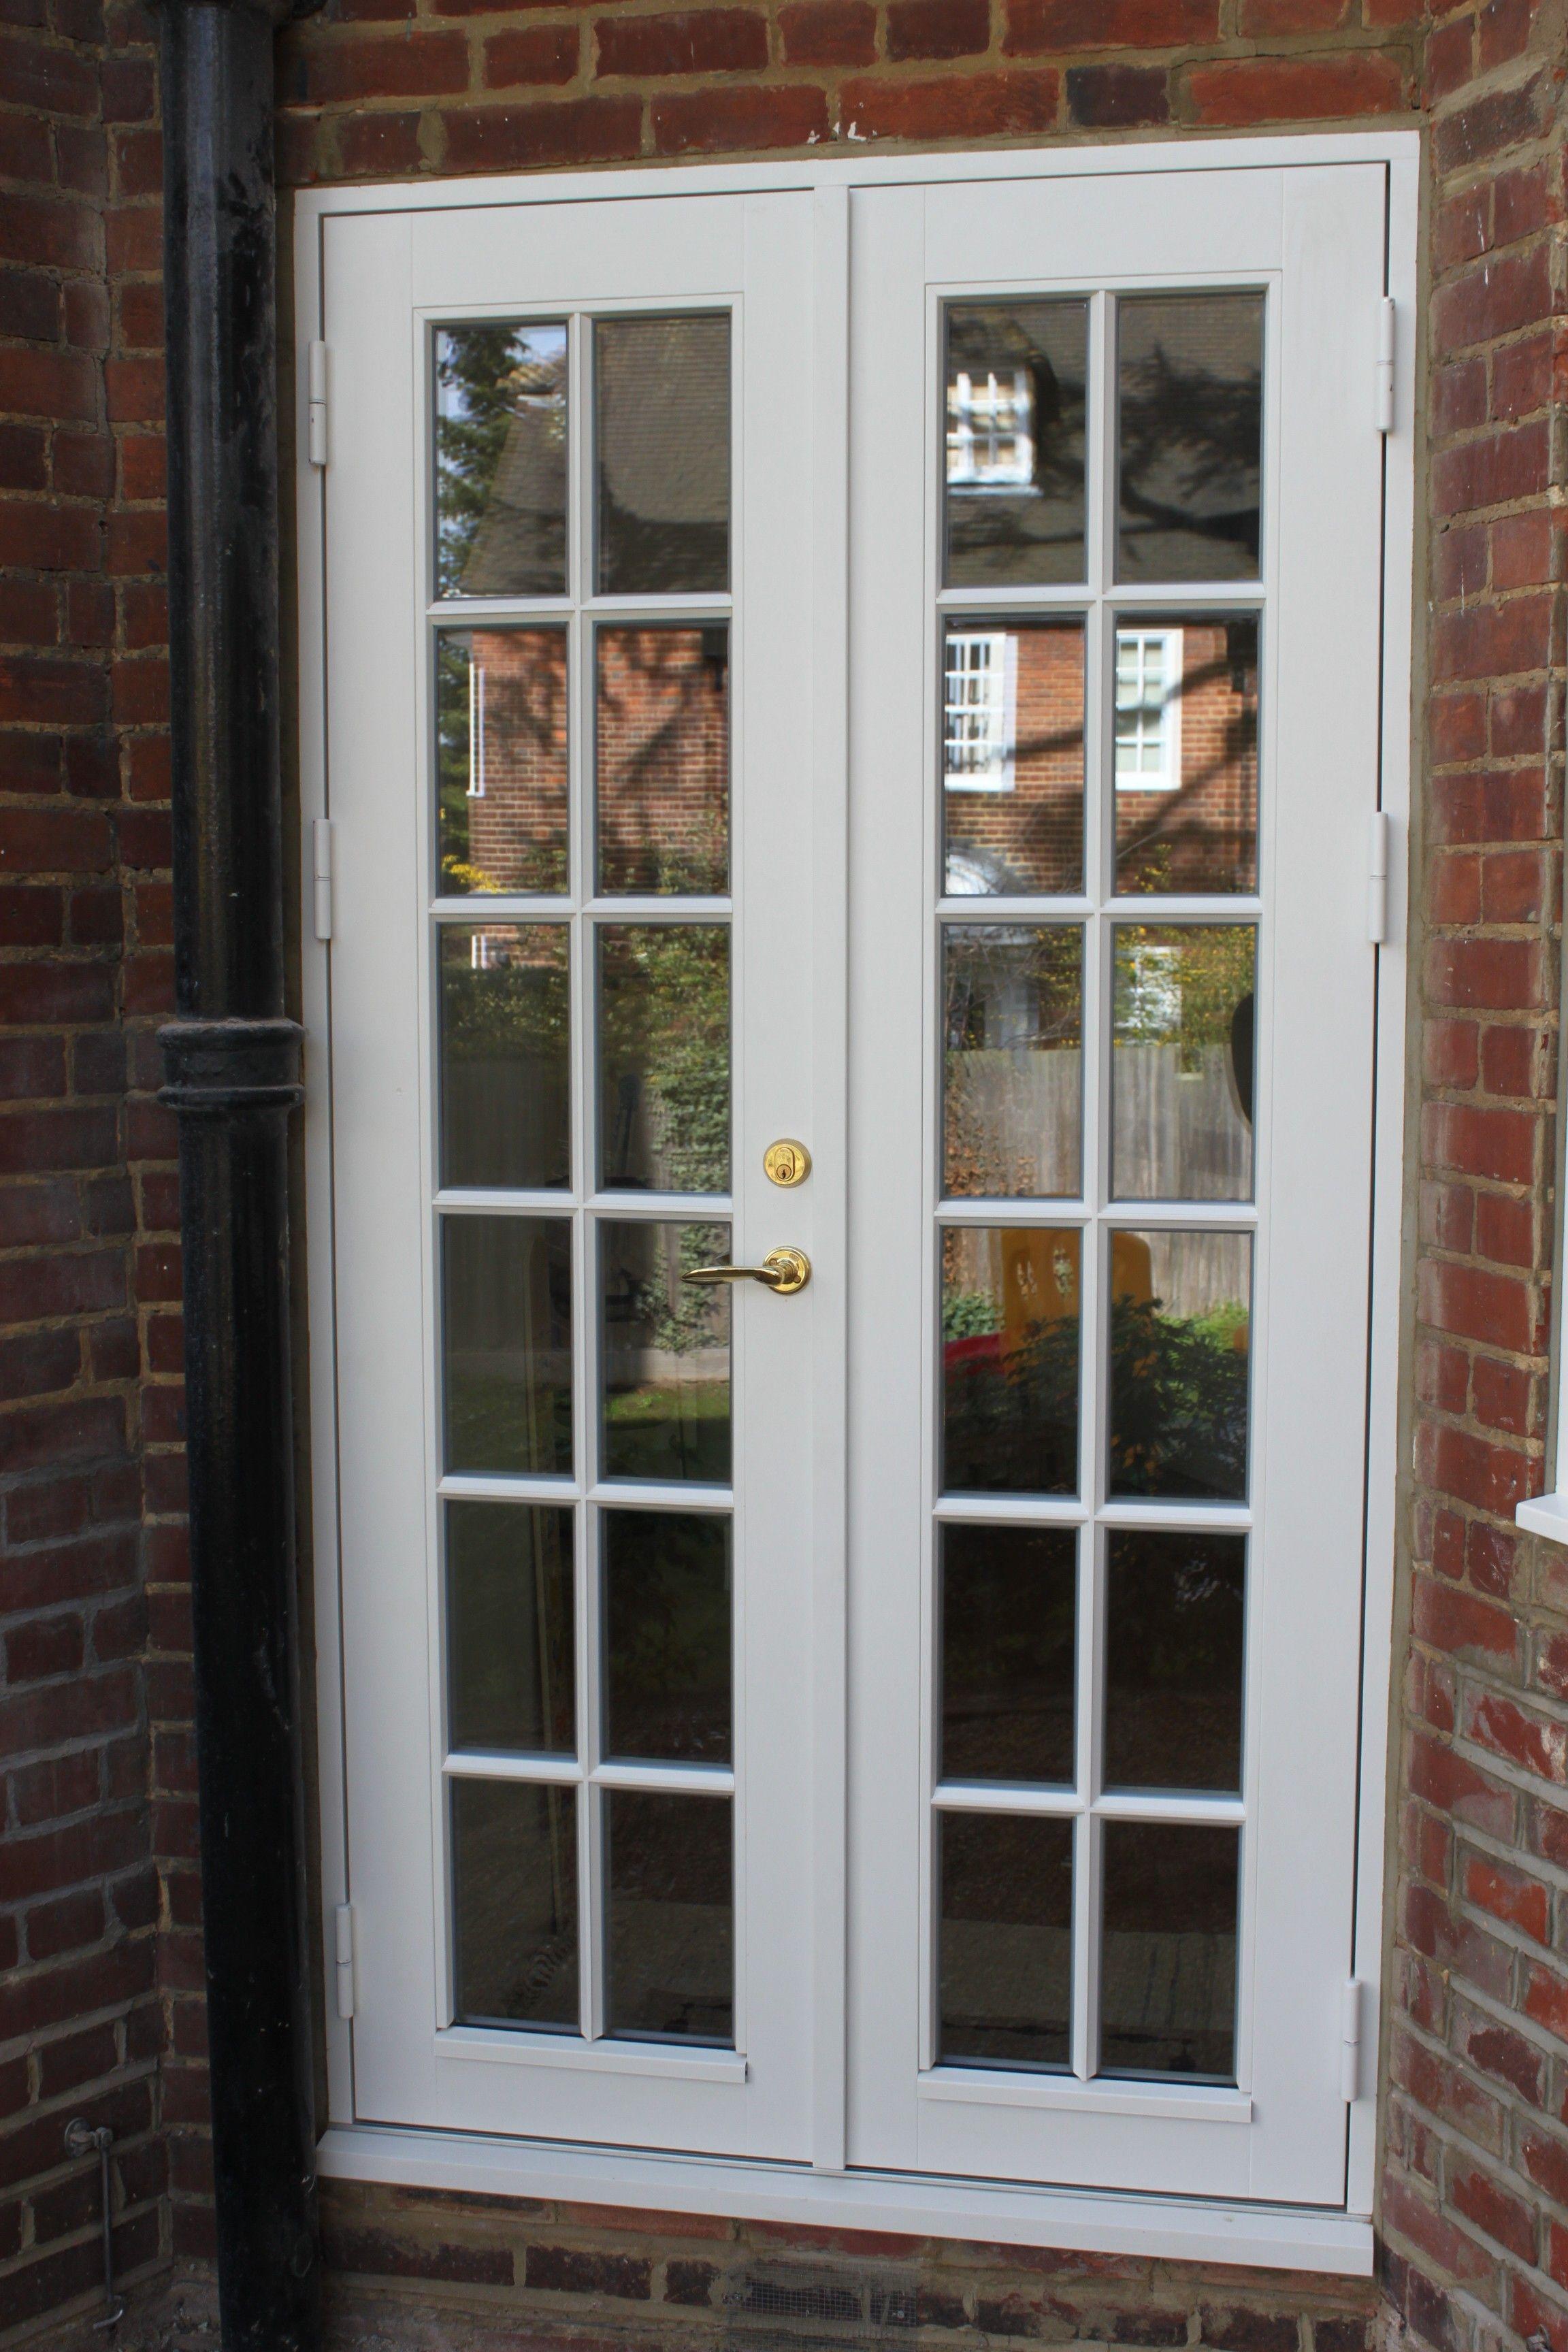 Sliding glass patio doors lock - Style Sliding Glass Patio Door Handle Hit W Smallest Pella Sliding Door Thumb Lock Champagne